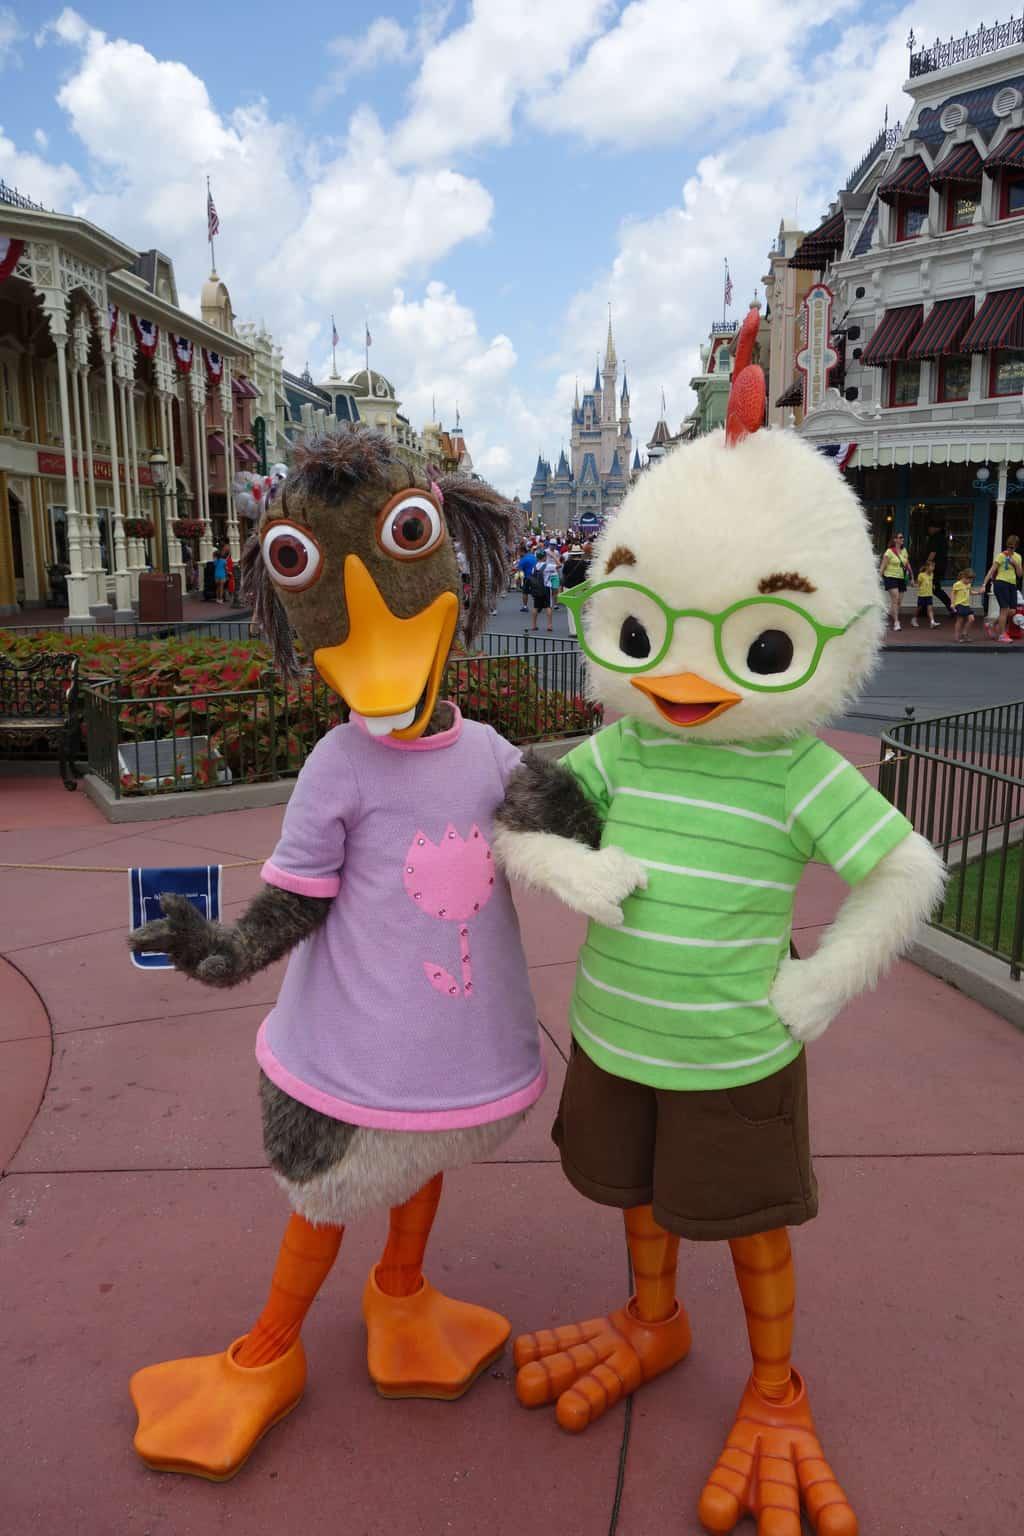 Abby Mallard and Chicken Little at Long-lost Friends Magic Kingdom Disney World